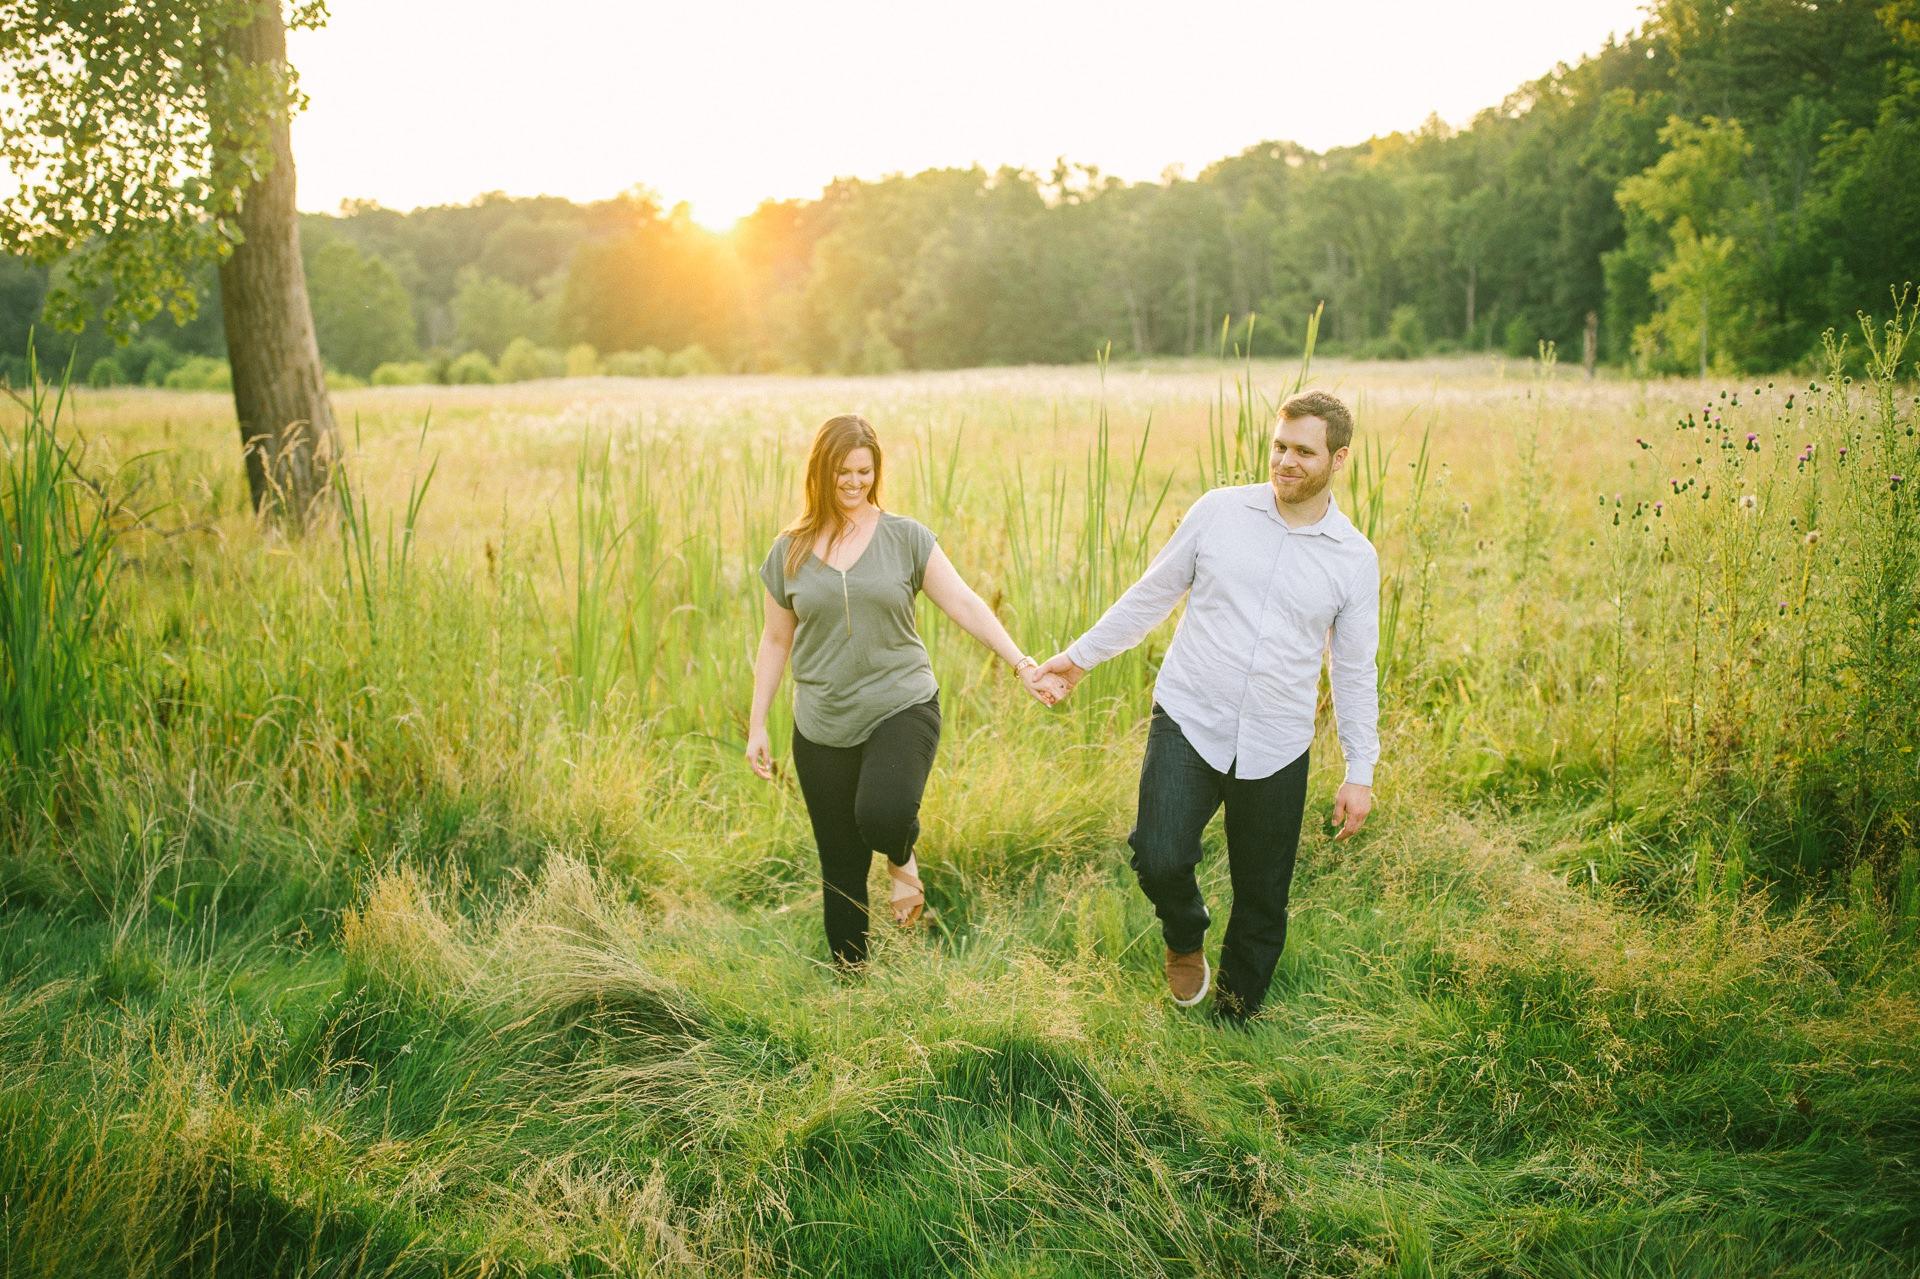 Cuyahoga Valley National Park Engagement Photos 12.jpg